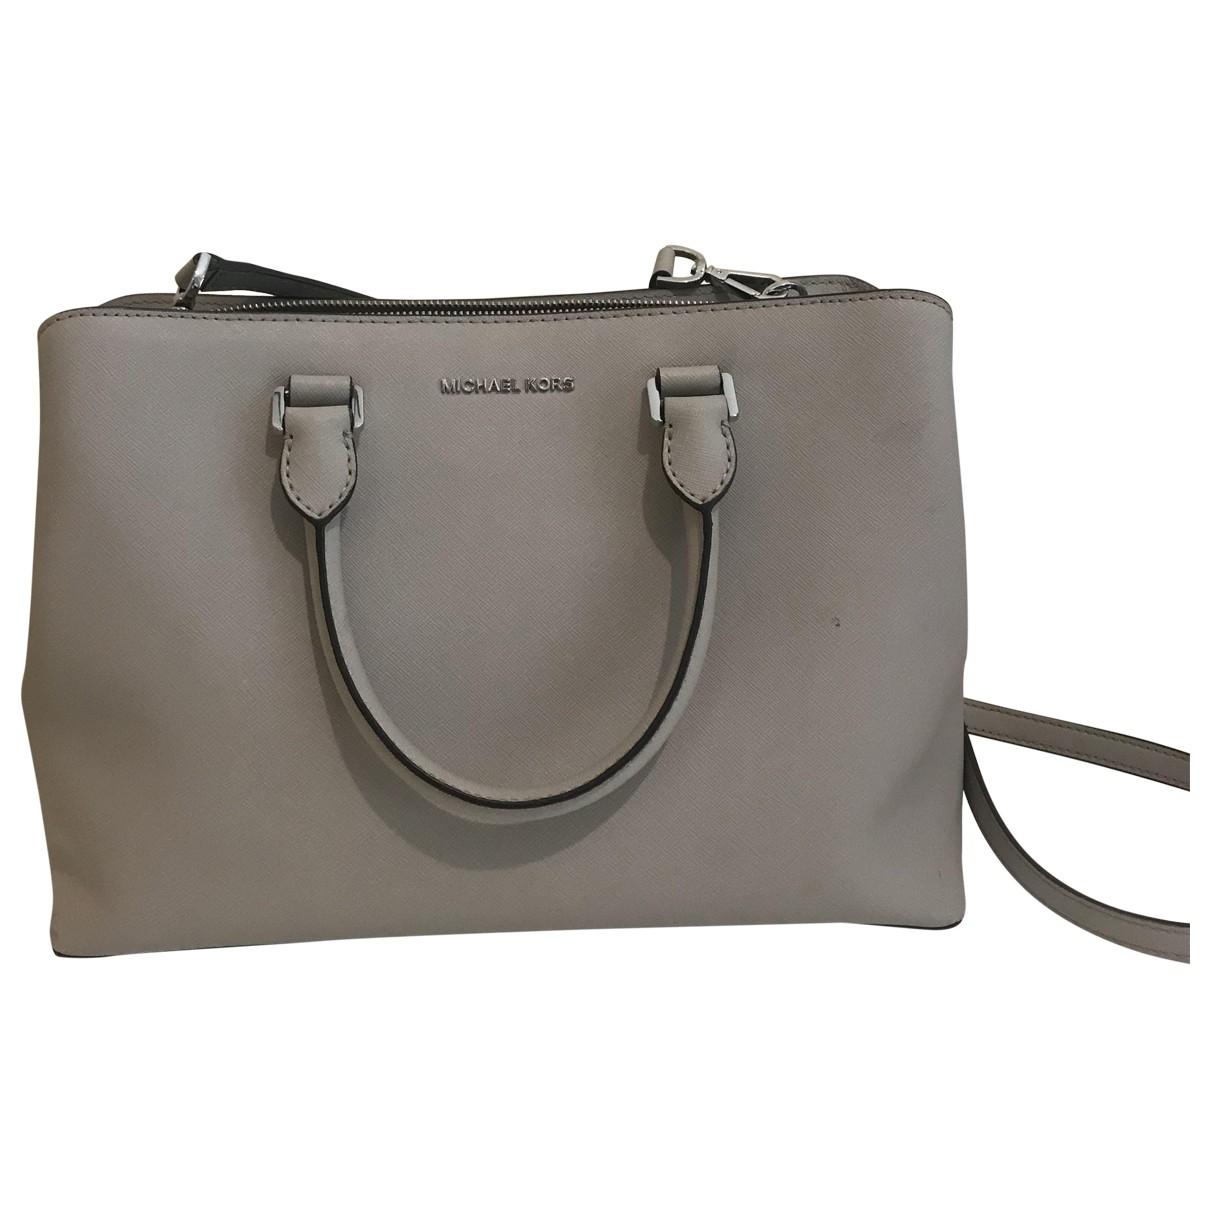 Michael Kors Savannah Handtasche in  Beige Lackleder